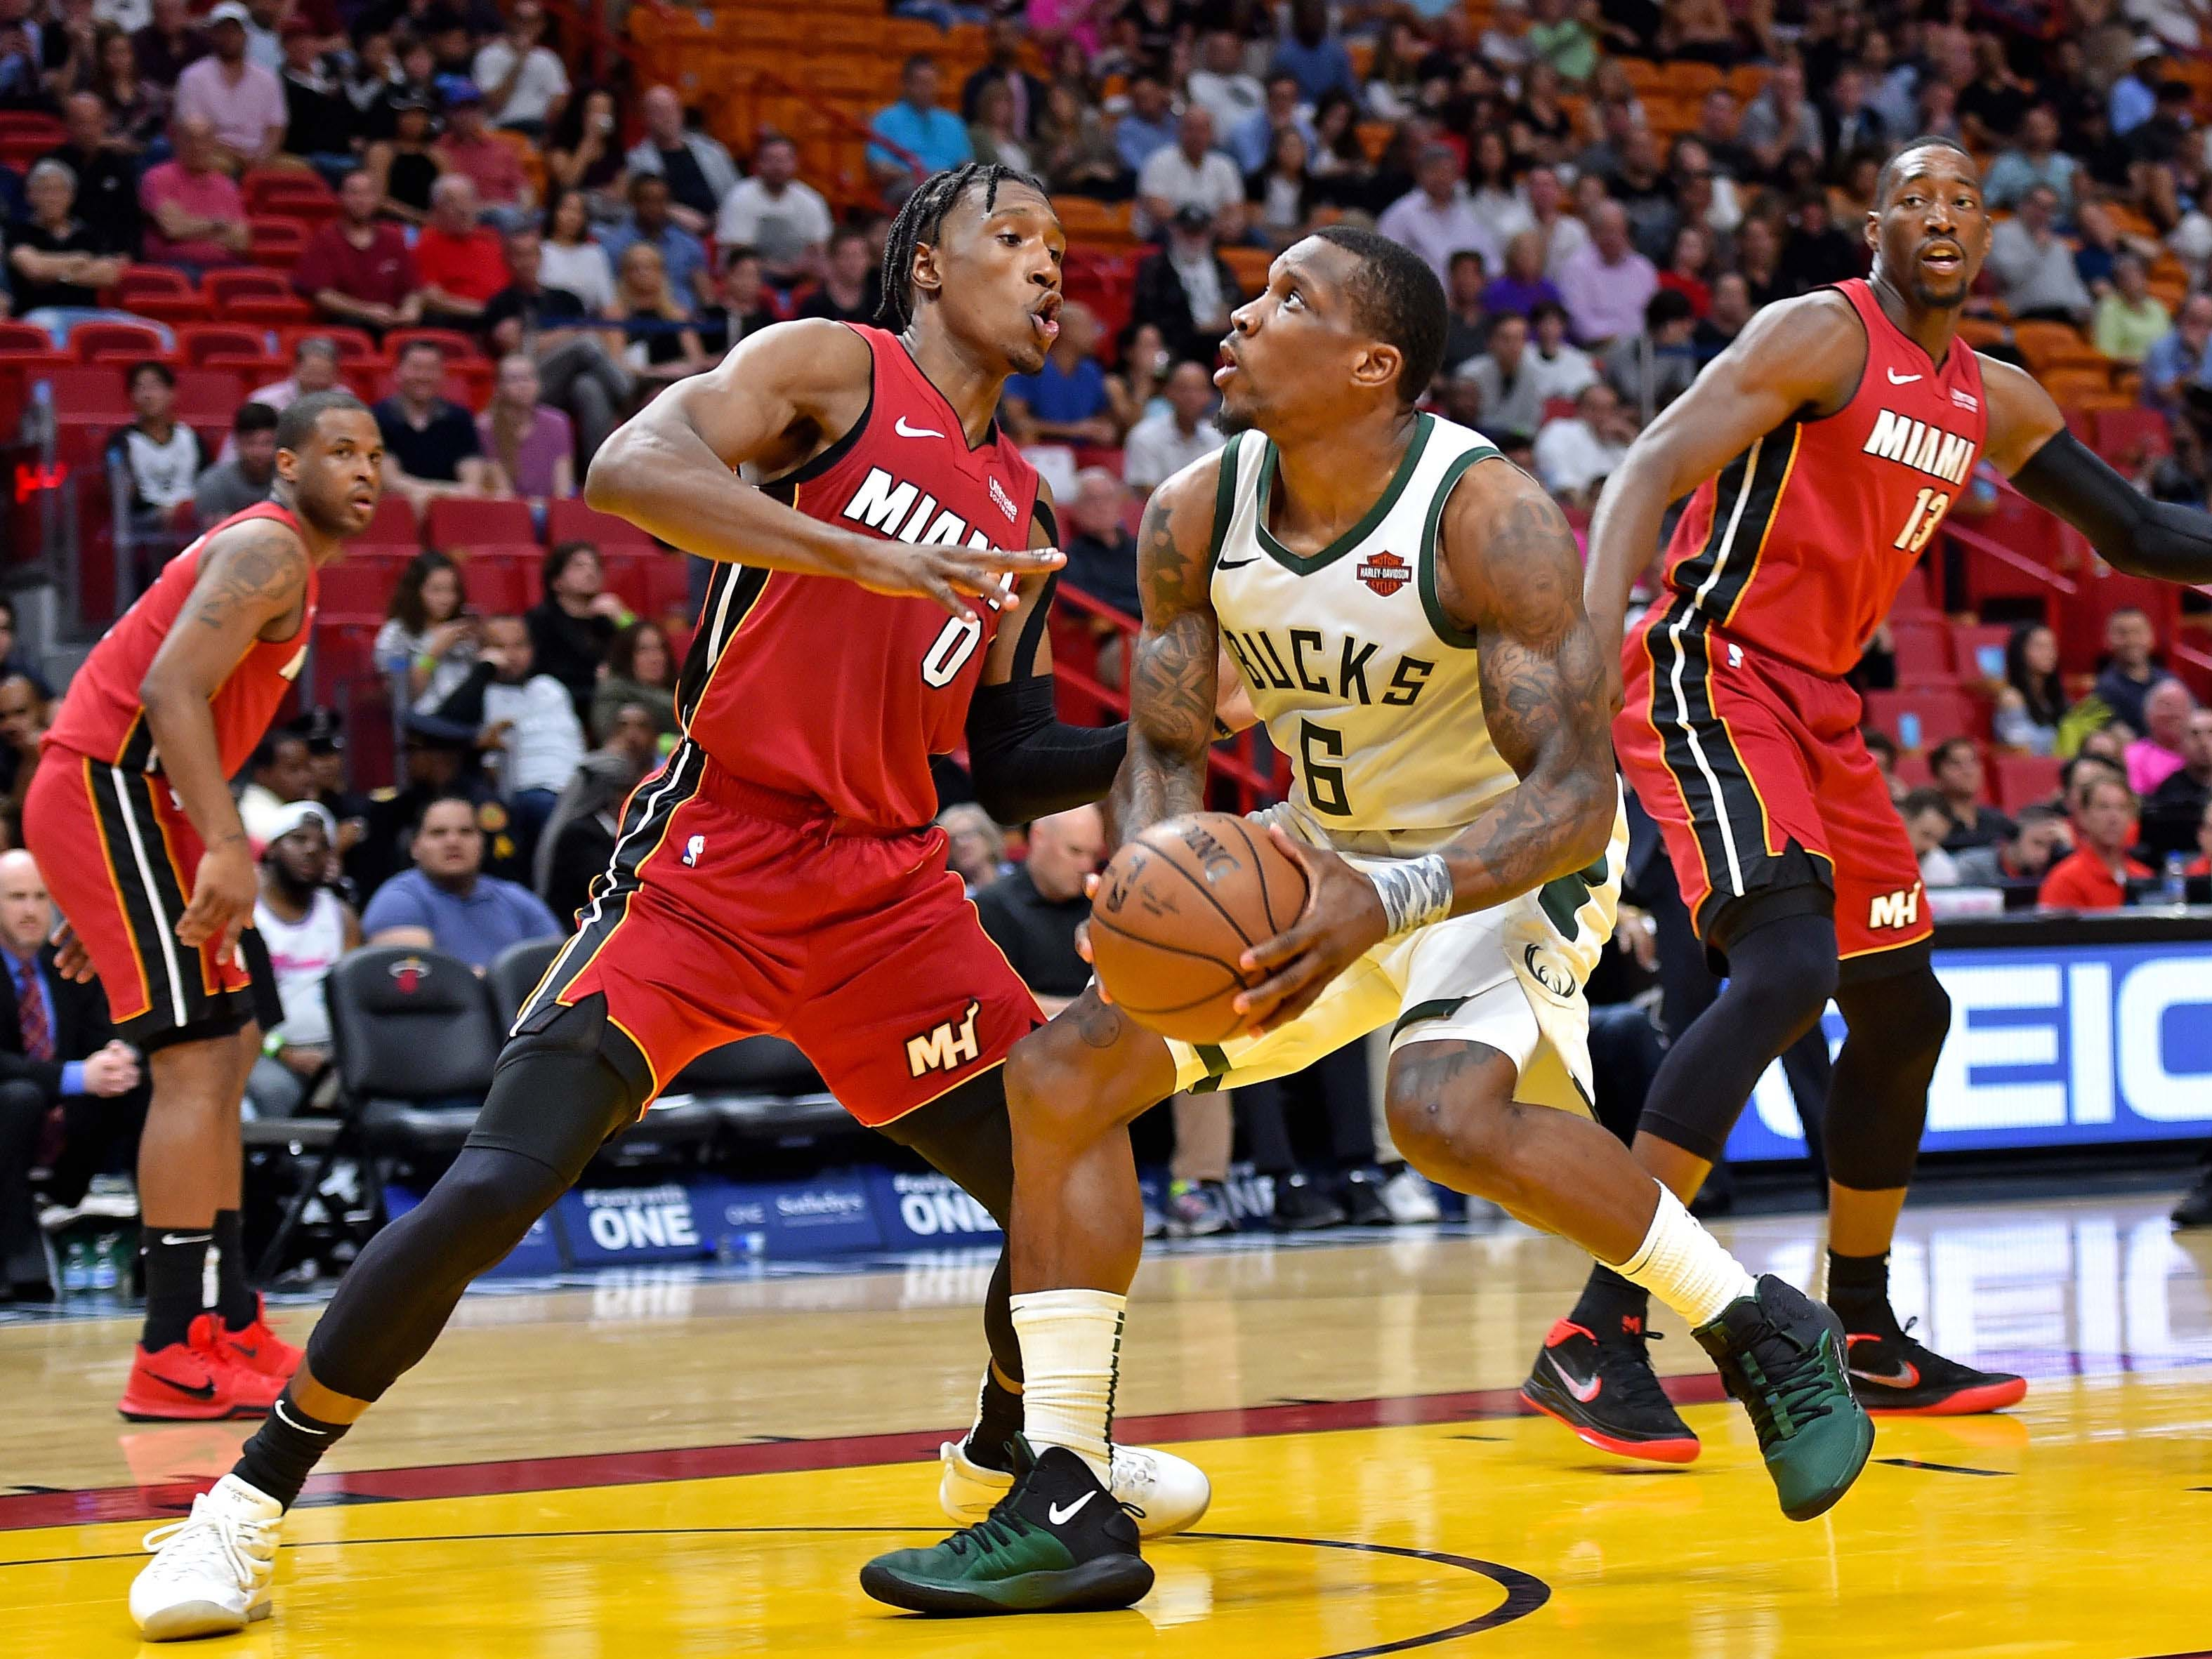 Bucks guard Eric Bledsoe attacks the basket despite the defense of Miami's Josh Richardson.